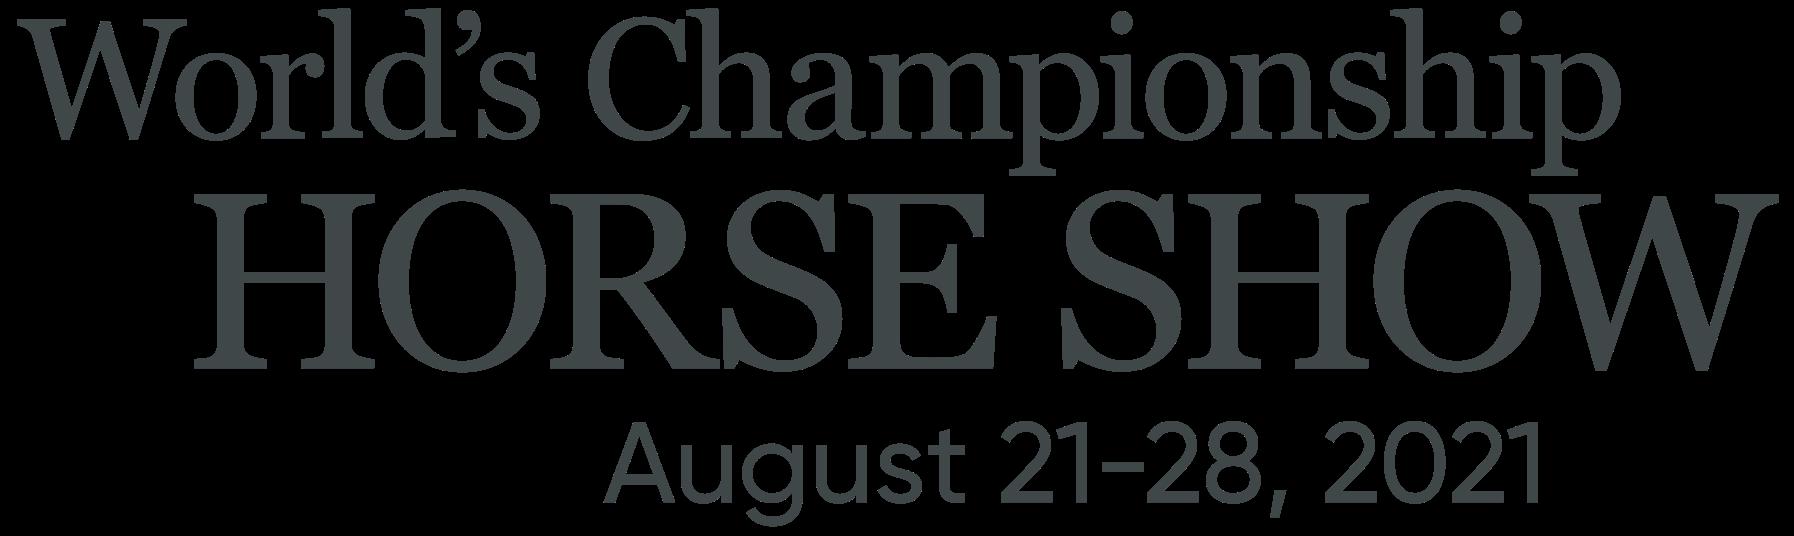 World Championship Horse Show Logo